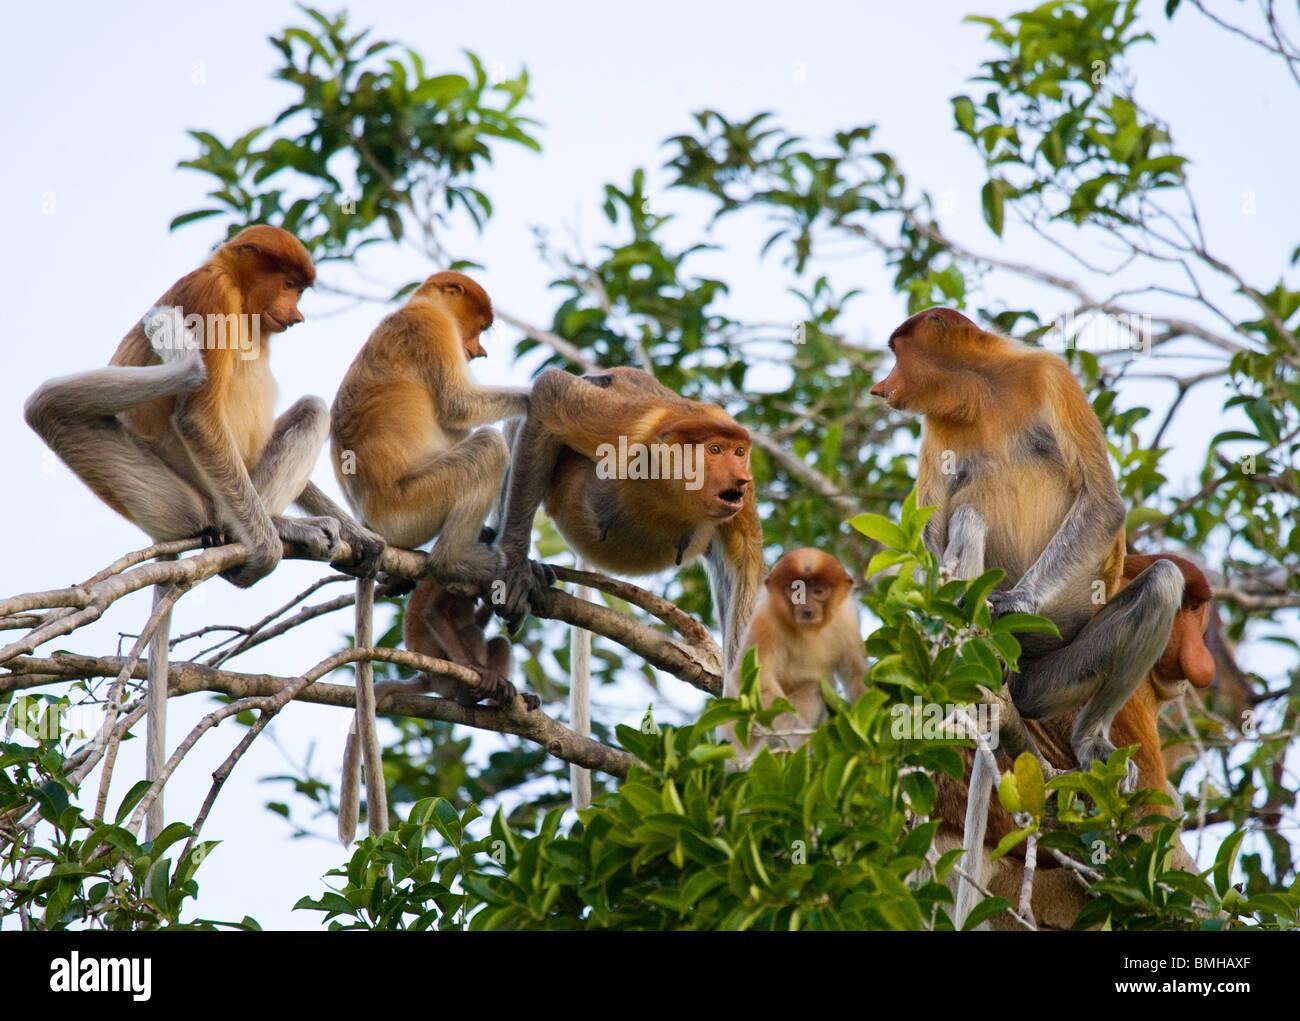 Proboscis monkeys, Tanjung Puting National Park, Kalimantan, Indonesia - Stock Image